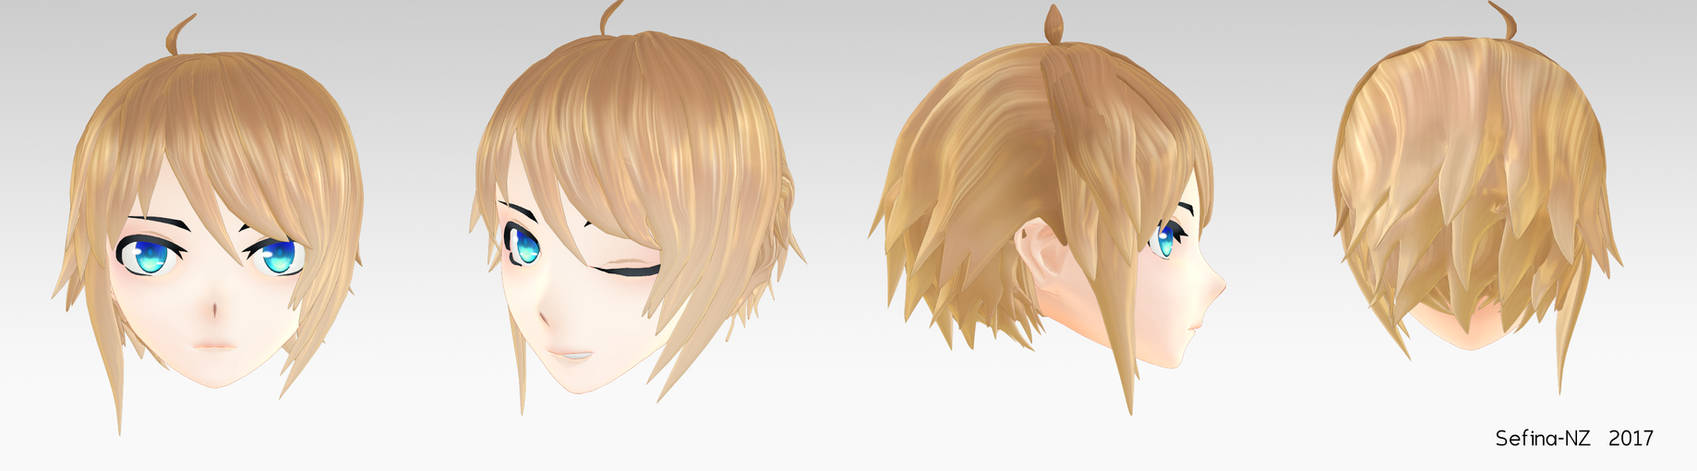 Short Blondish Brown Hair+DL